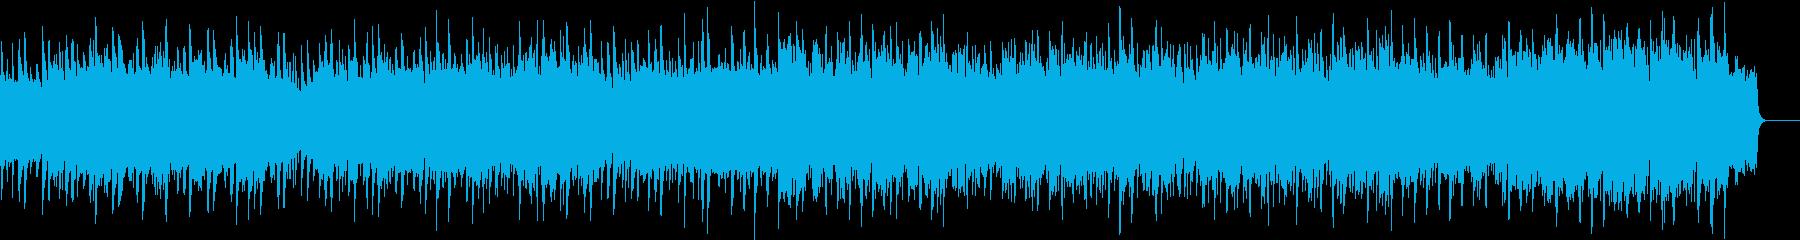 和風 田舎 京都 紀行 歴史 伝統 正月の再生済みの波形